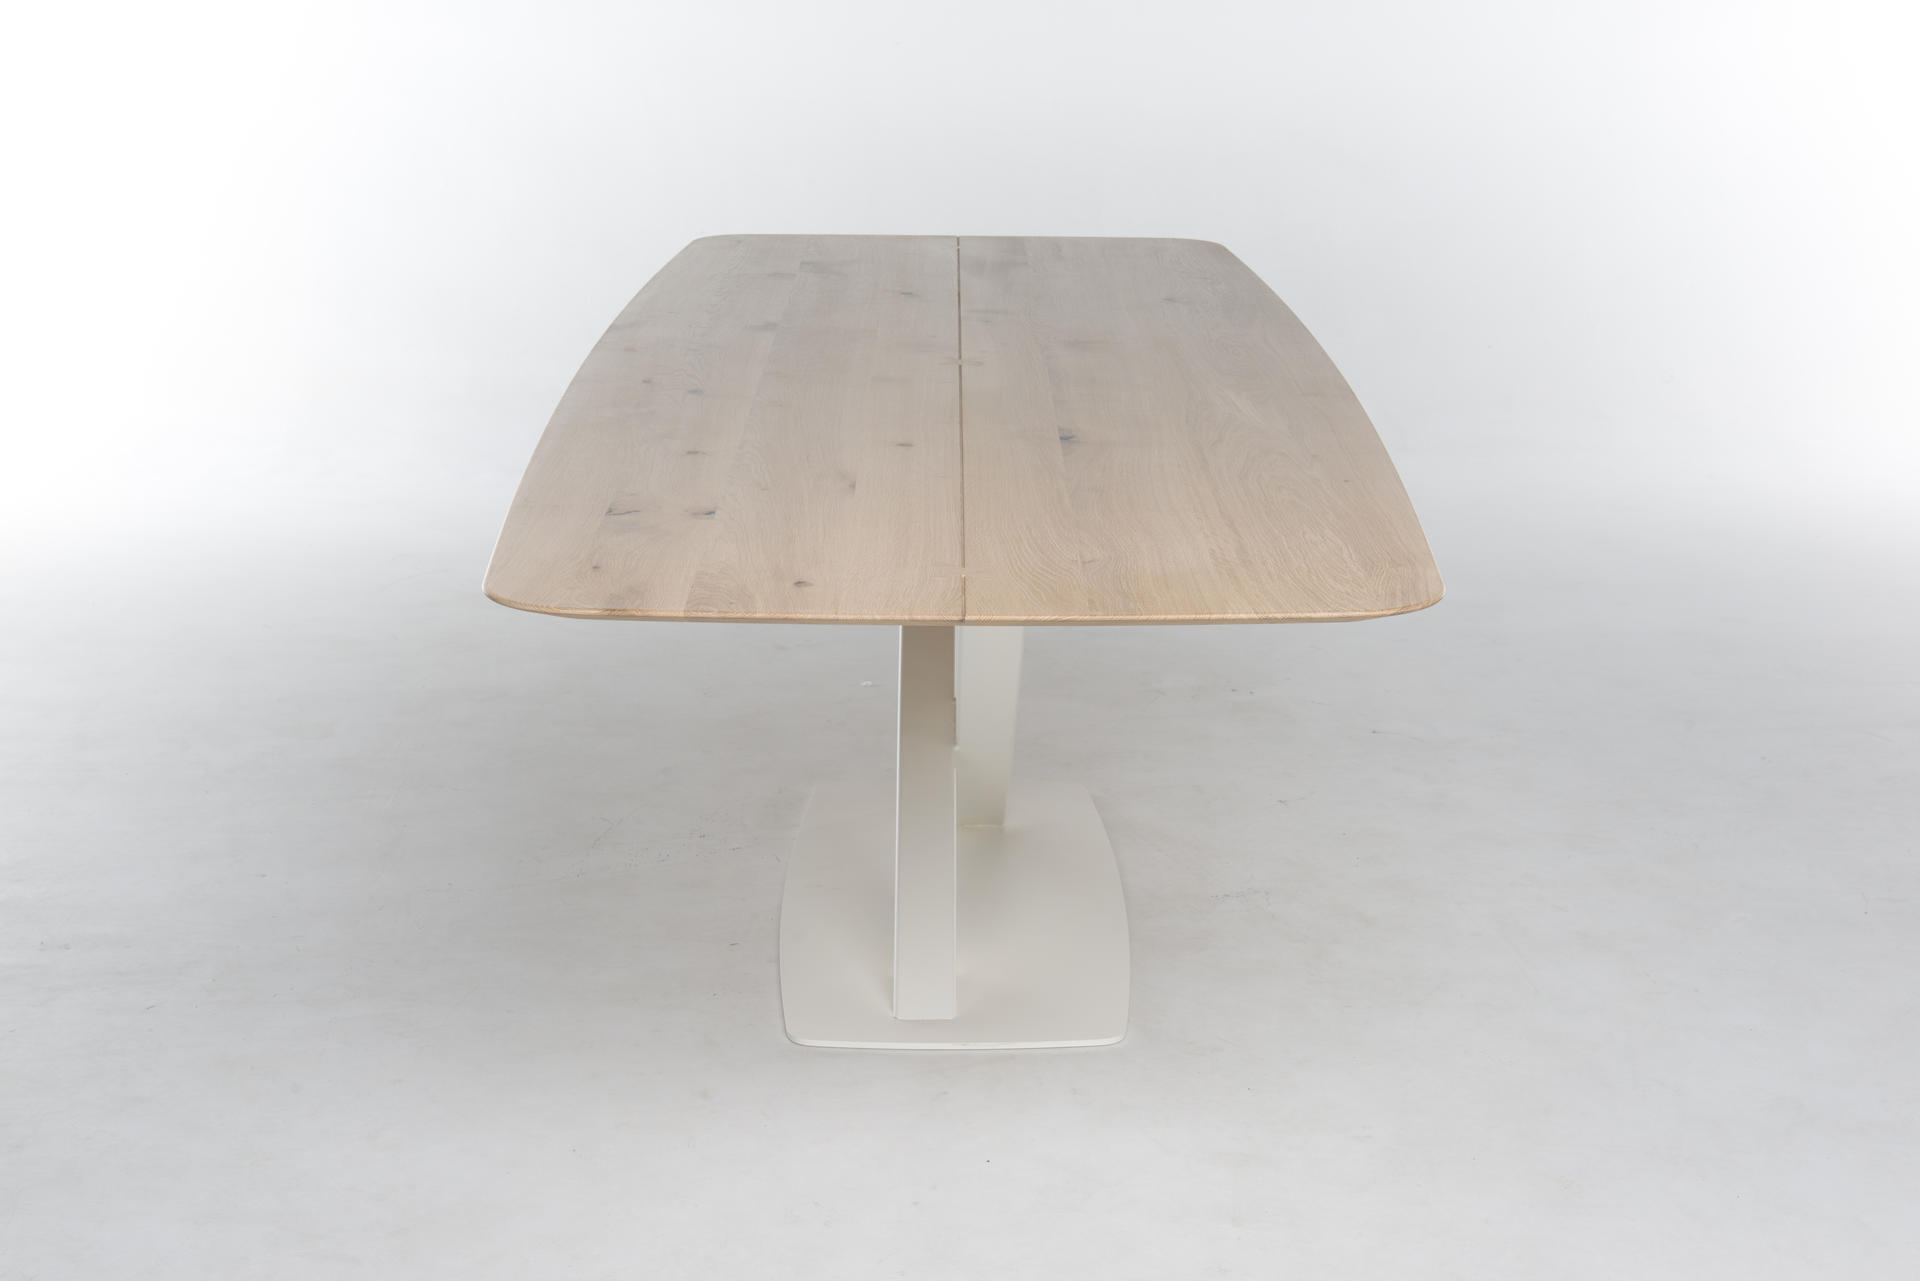 Стол OXXI, Bert Plantagie, фото 2